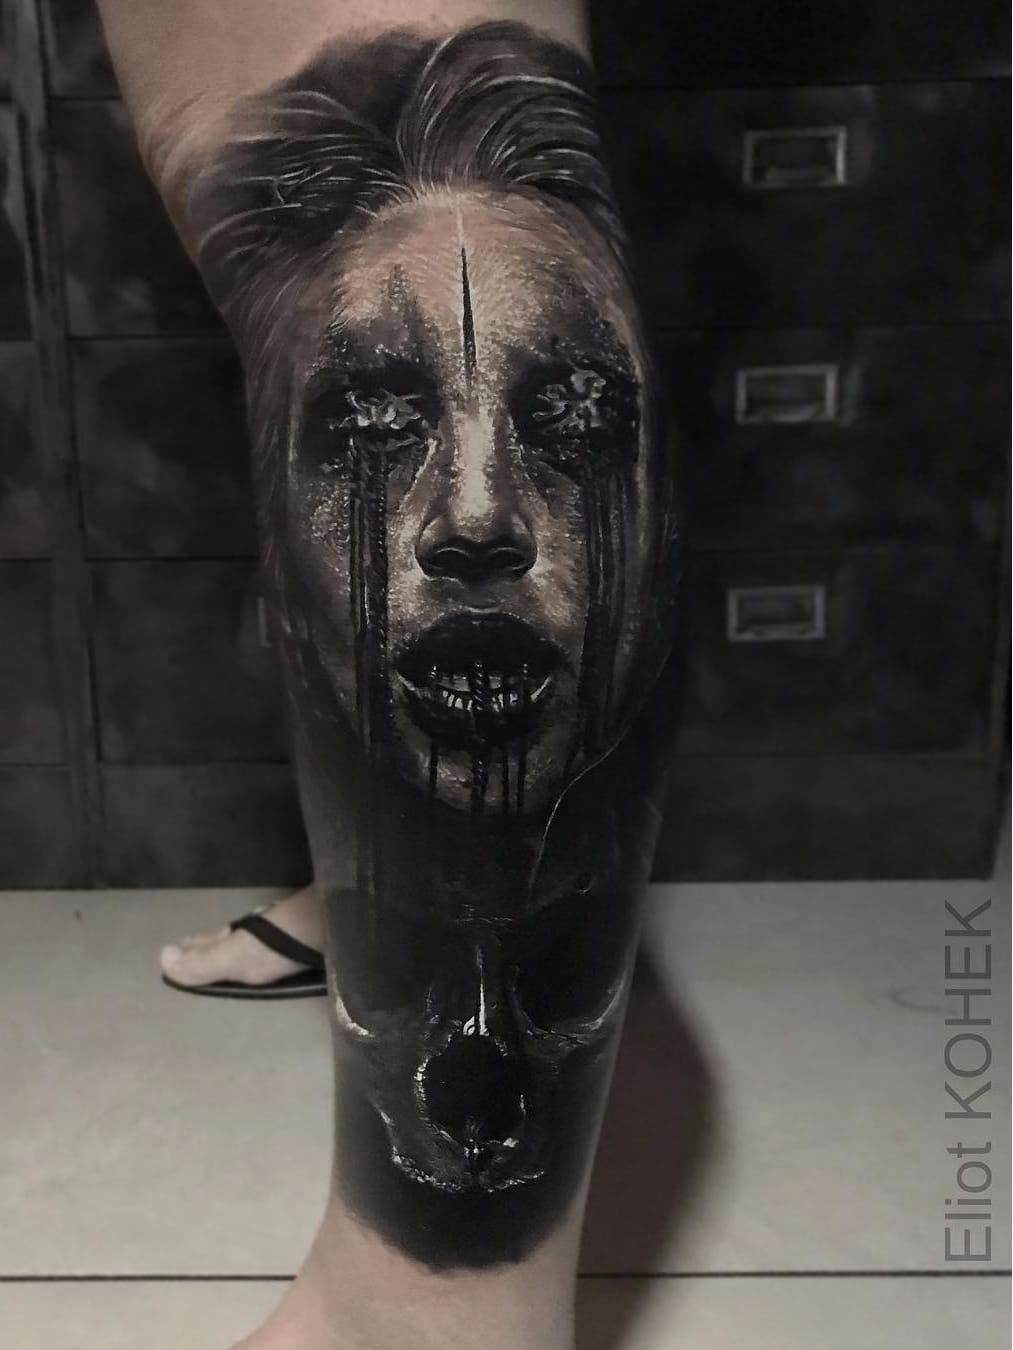 Por Eliot Kohek #EliotKohek #gringo #realismo #realism #pretoecinza #blackandgrey #skull #caveira #mulher #woman #dark #terror #horror #cranio